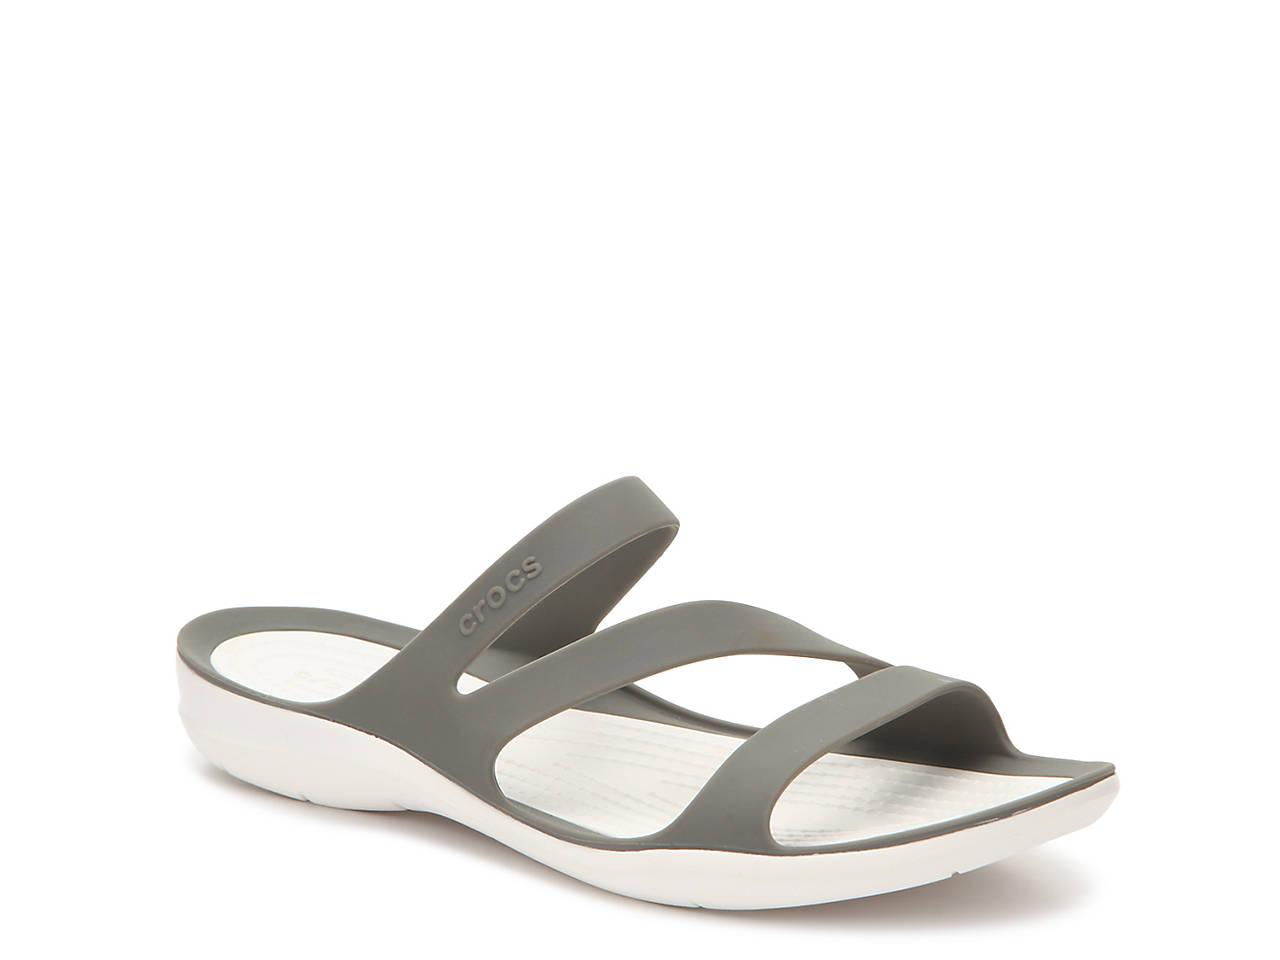 3633bafd6edb Crocs Swiftwater Sandal Women s Shoes